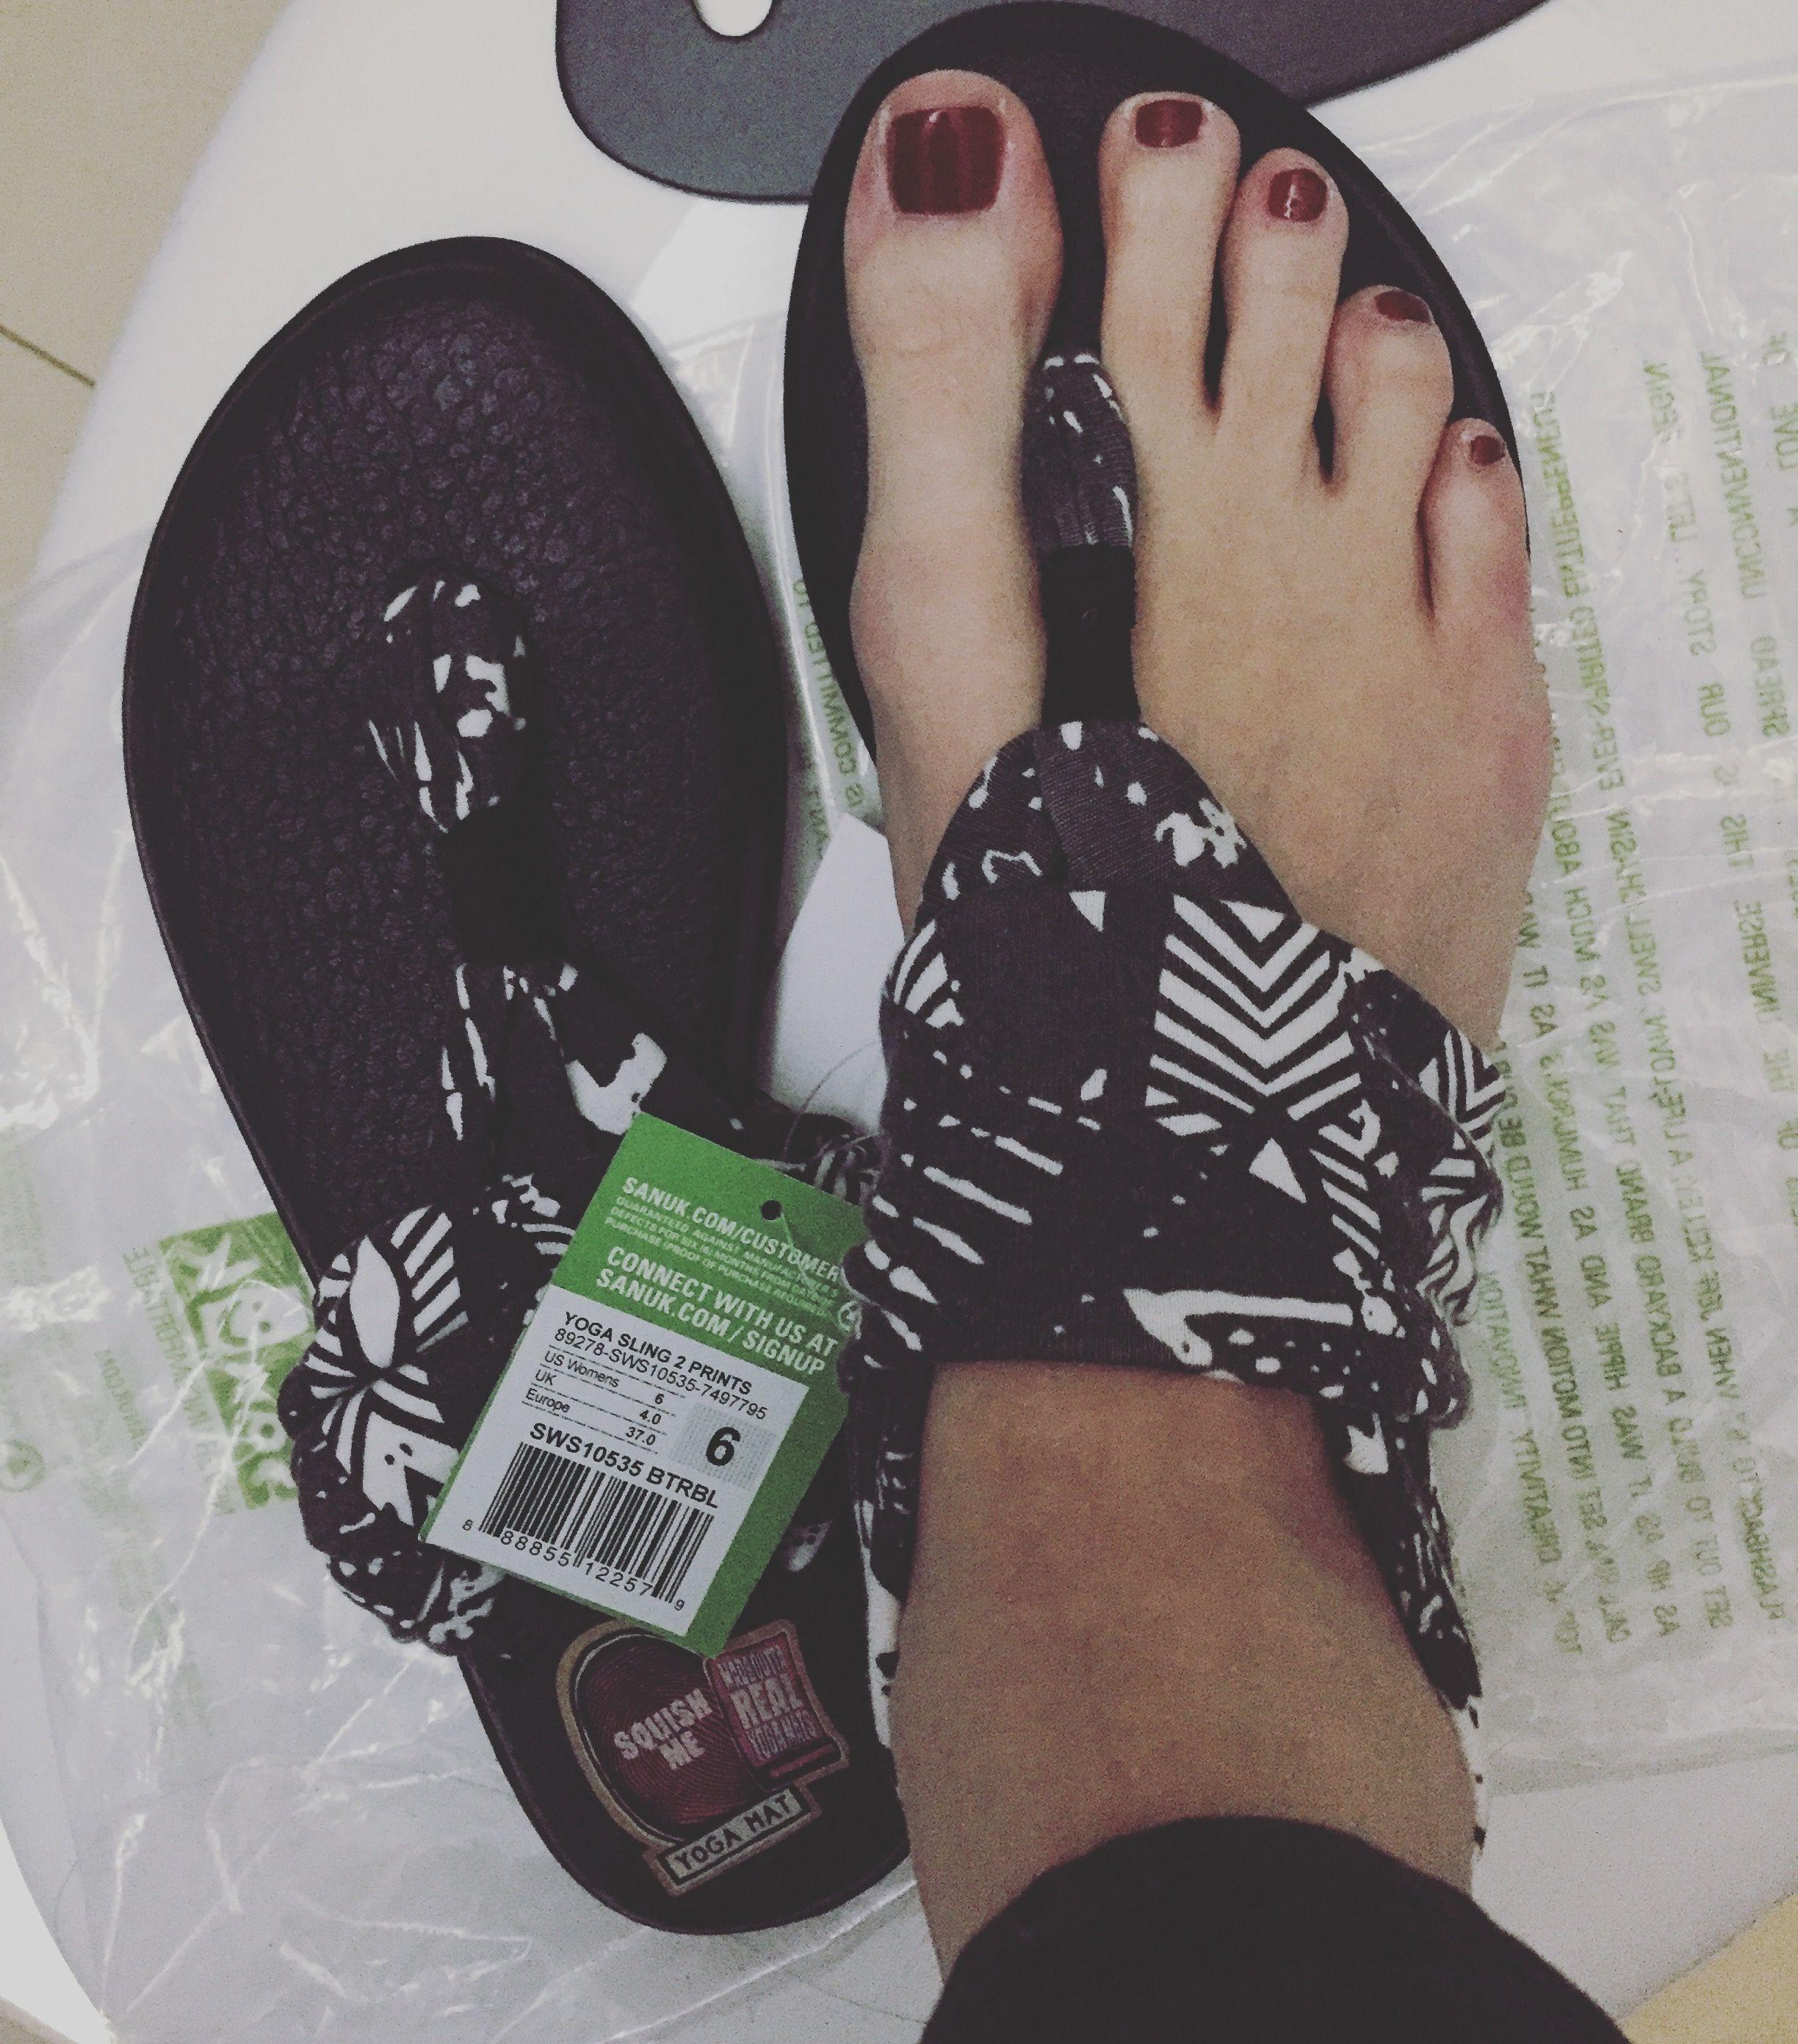 sanuk x mat tobruckave lookbook mats yoga always dreamcatcher flop sandals dreaming loobook flip